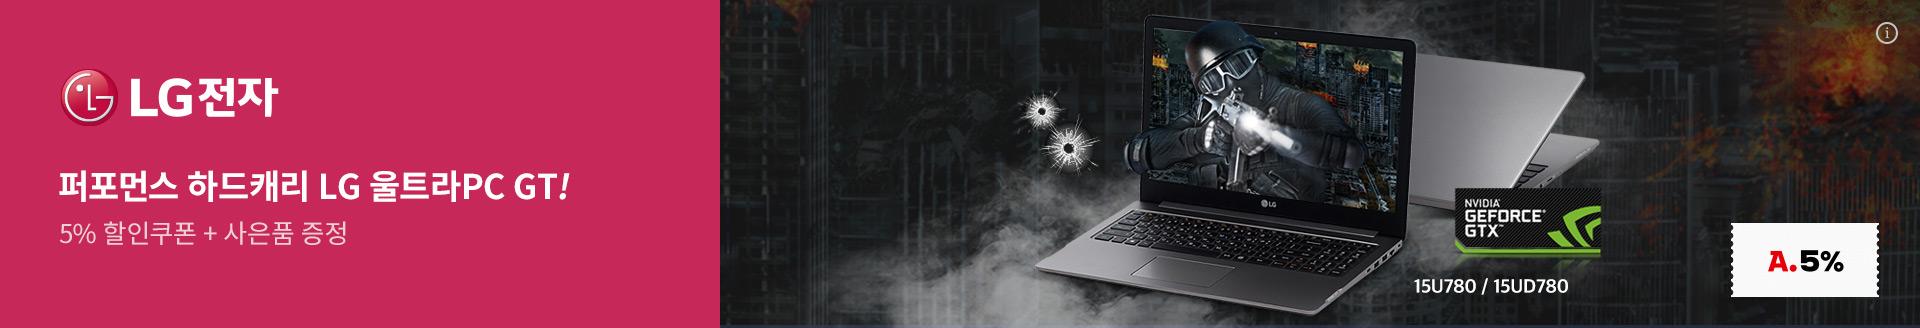 LG전자 - 퍼포먼스 하드캐리 울트라 PC GT